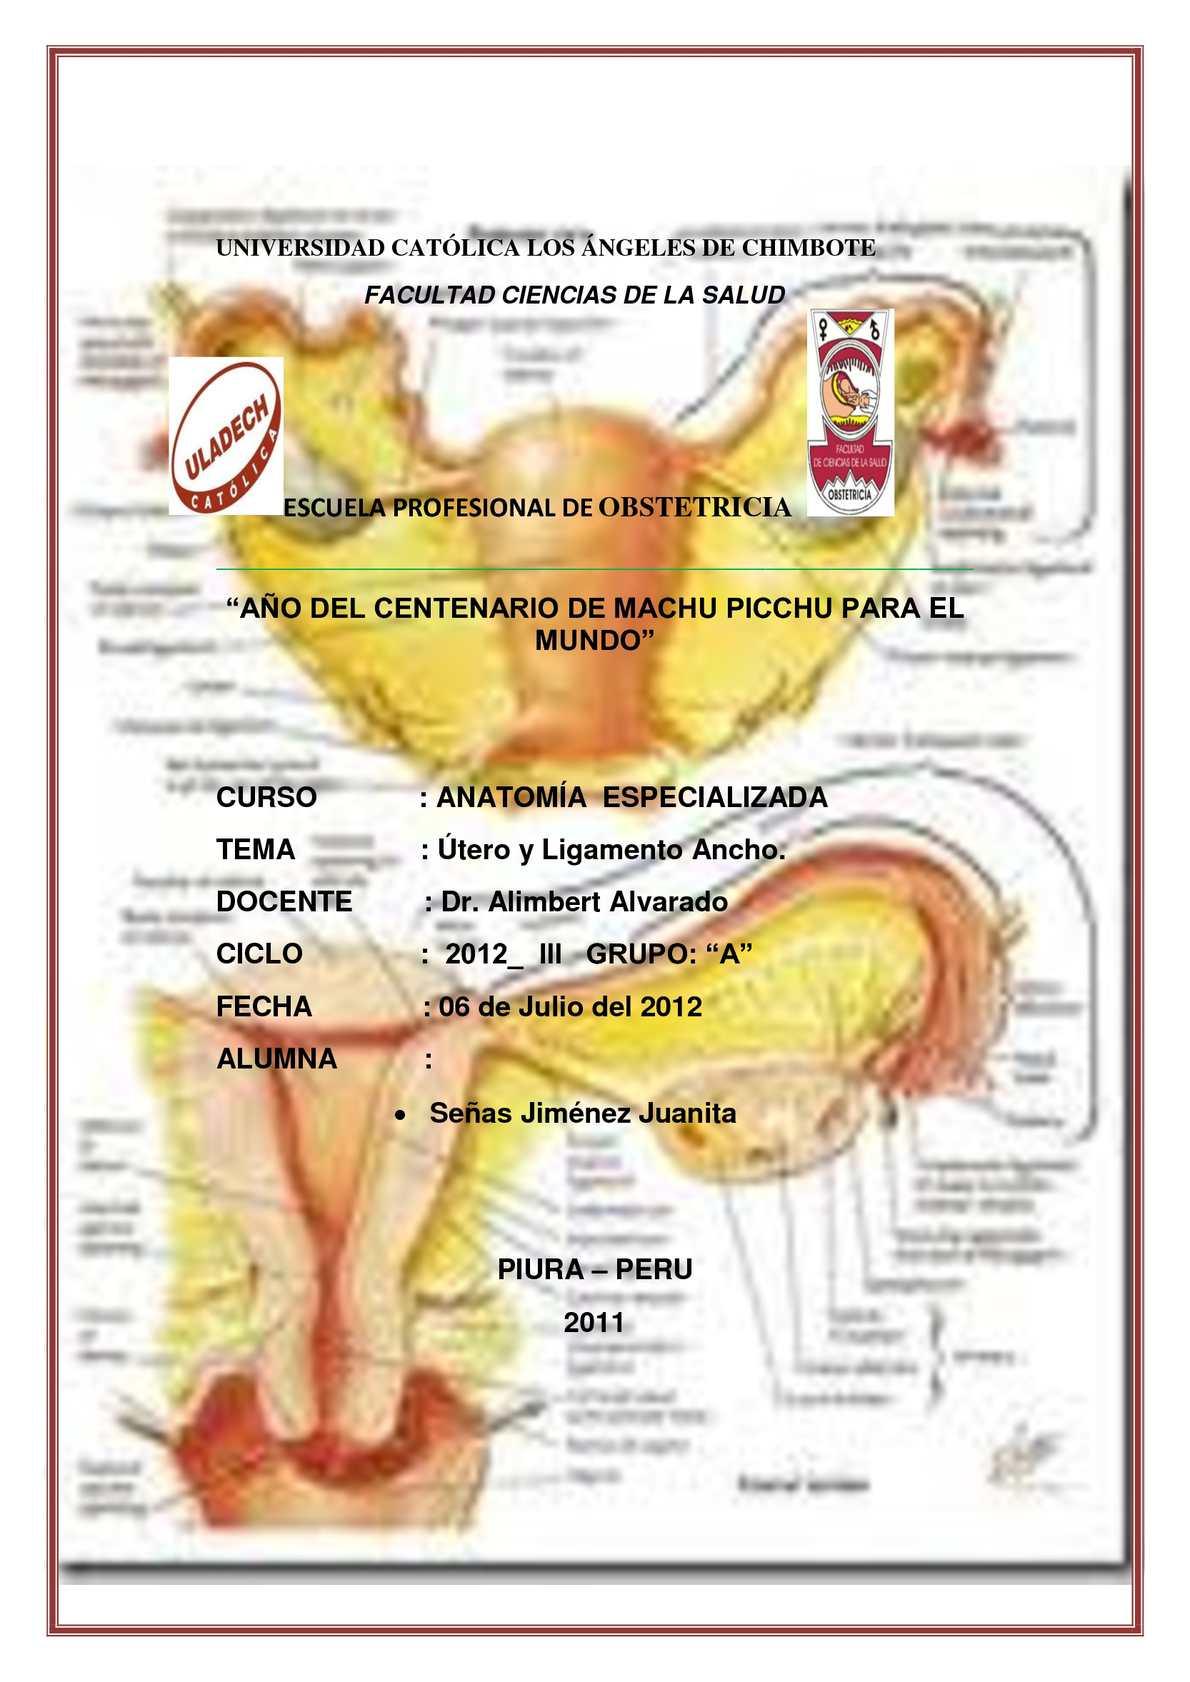 Calaméo - Utero y Ligamento Ancho